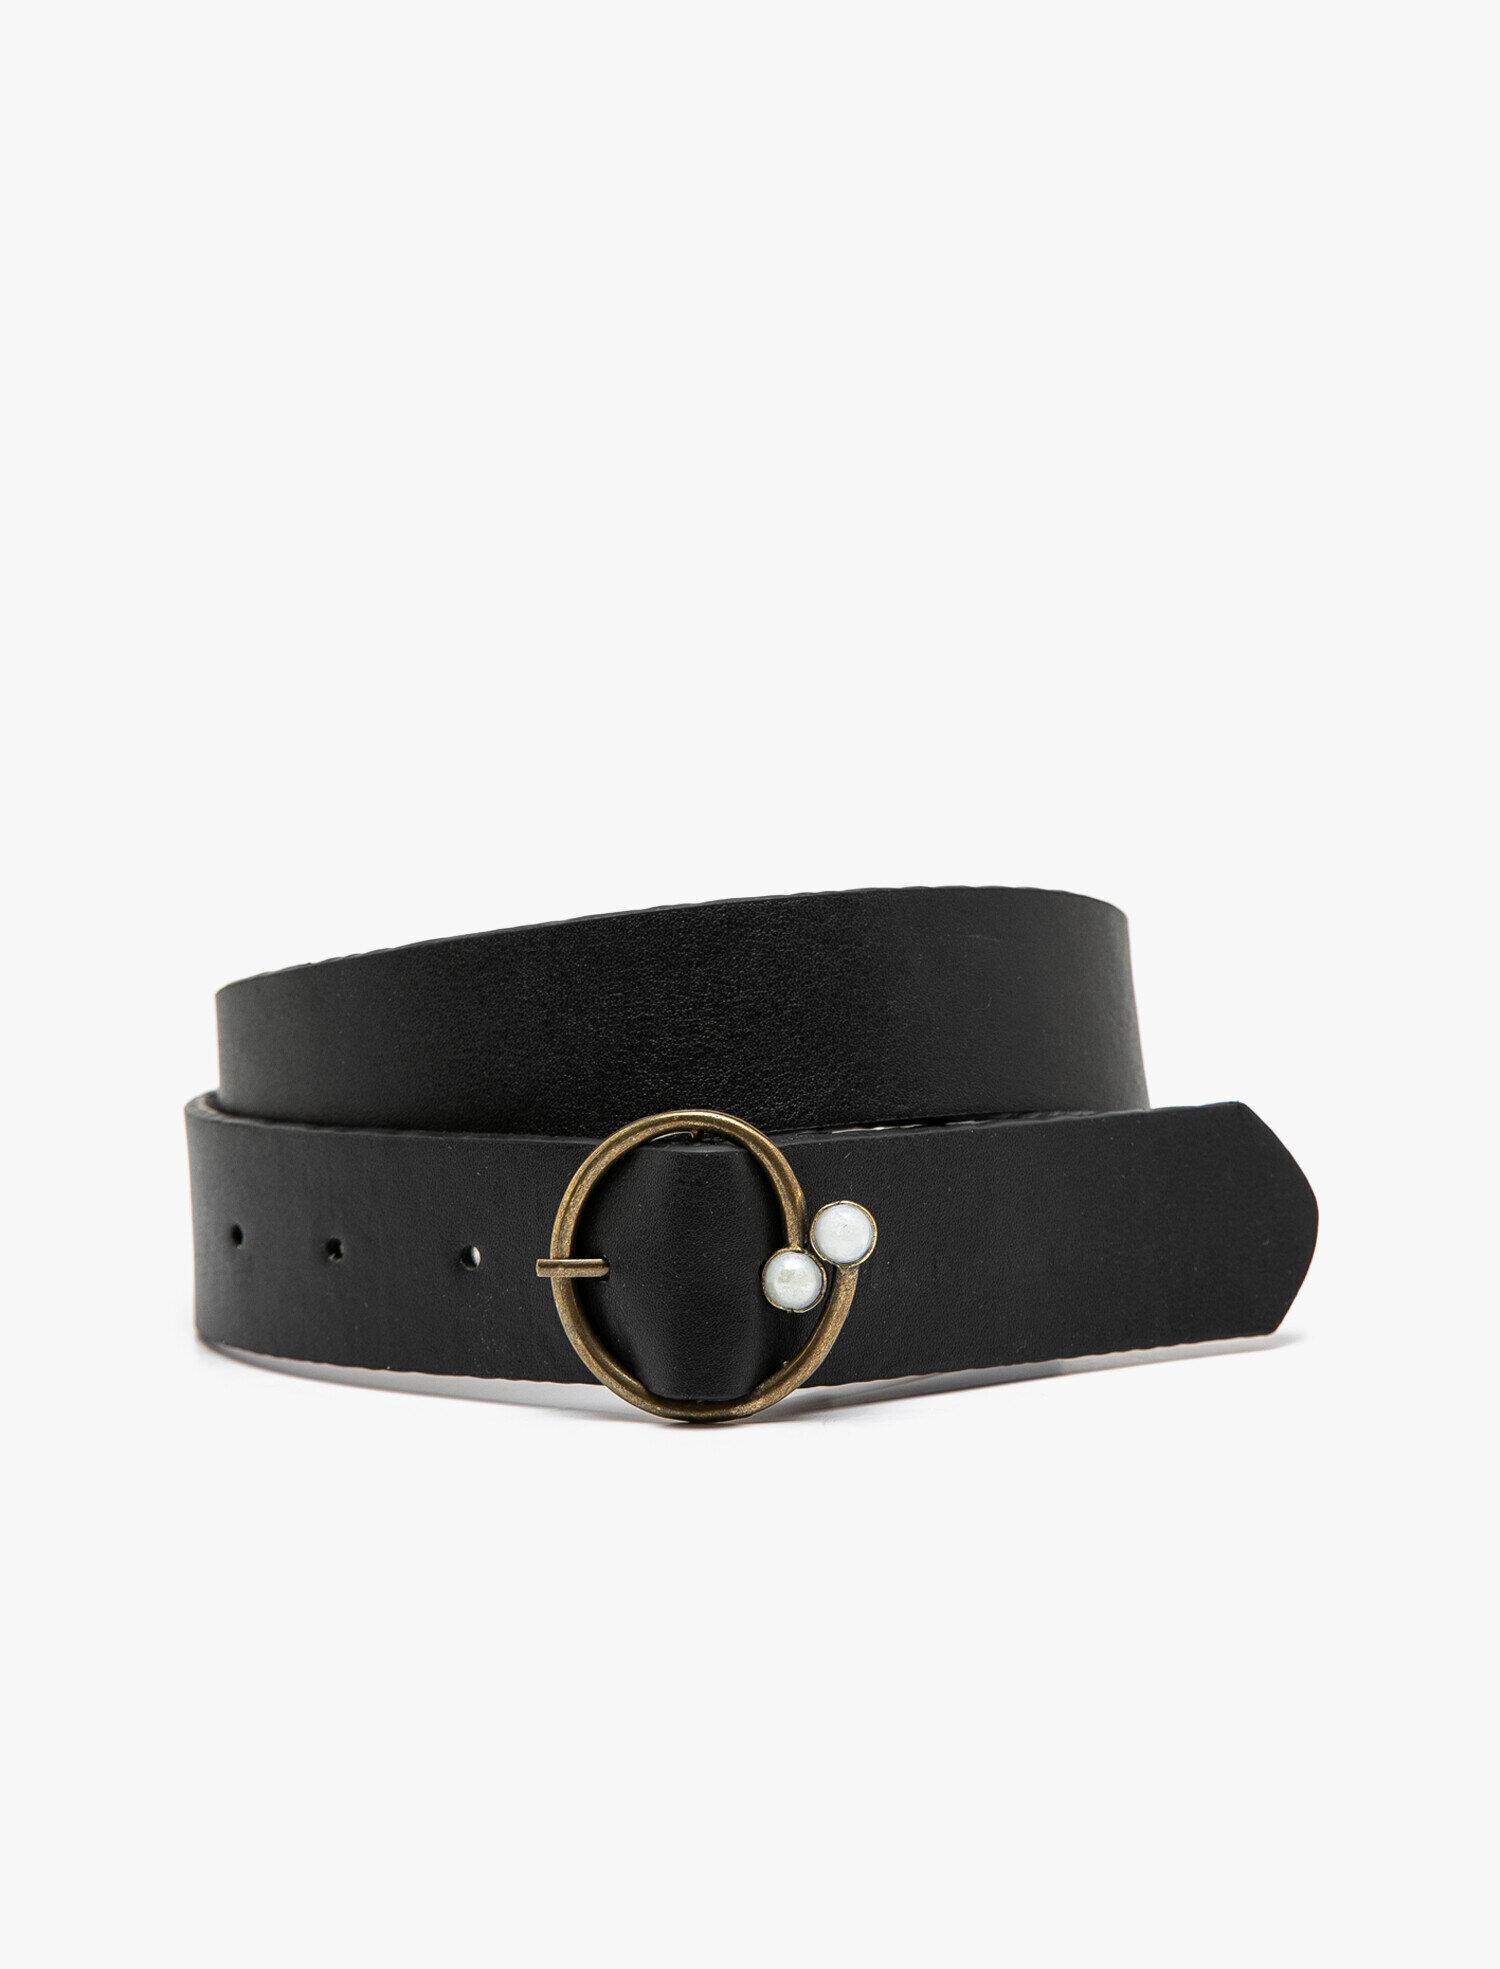 Leather Look Belt